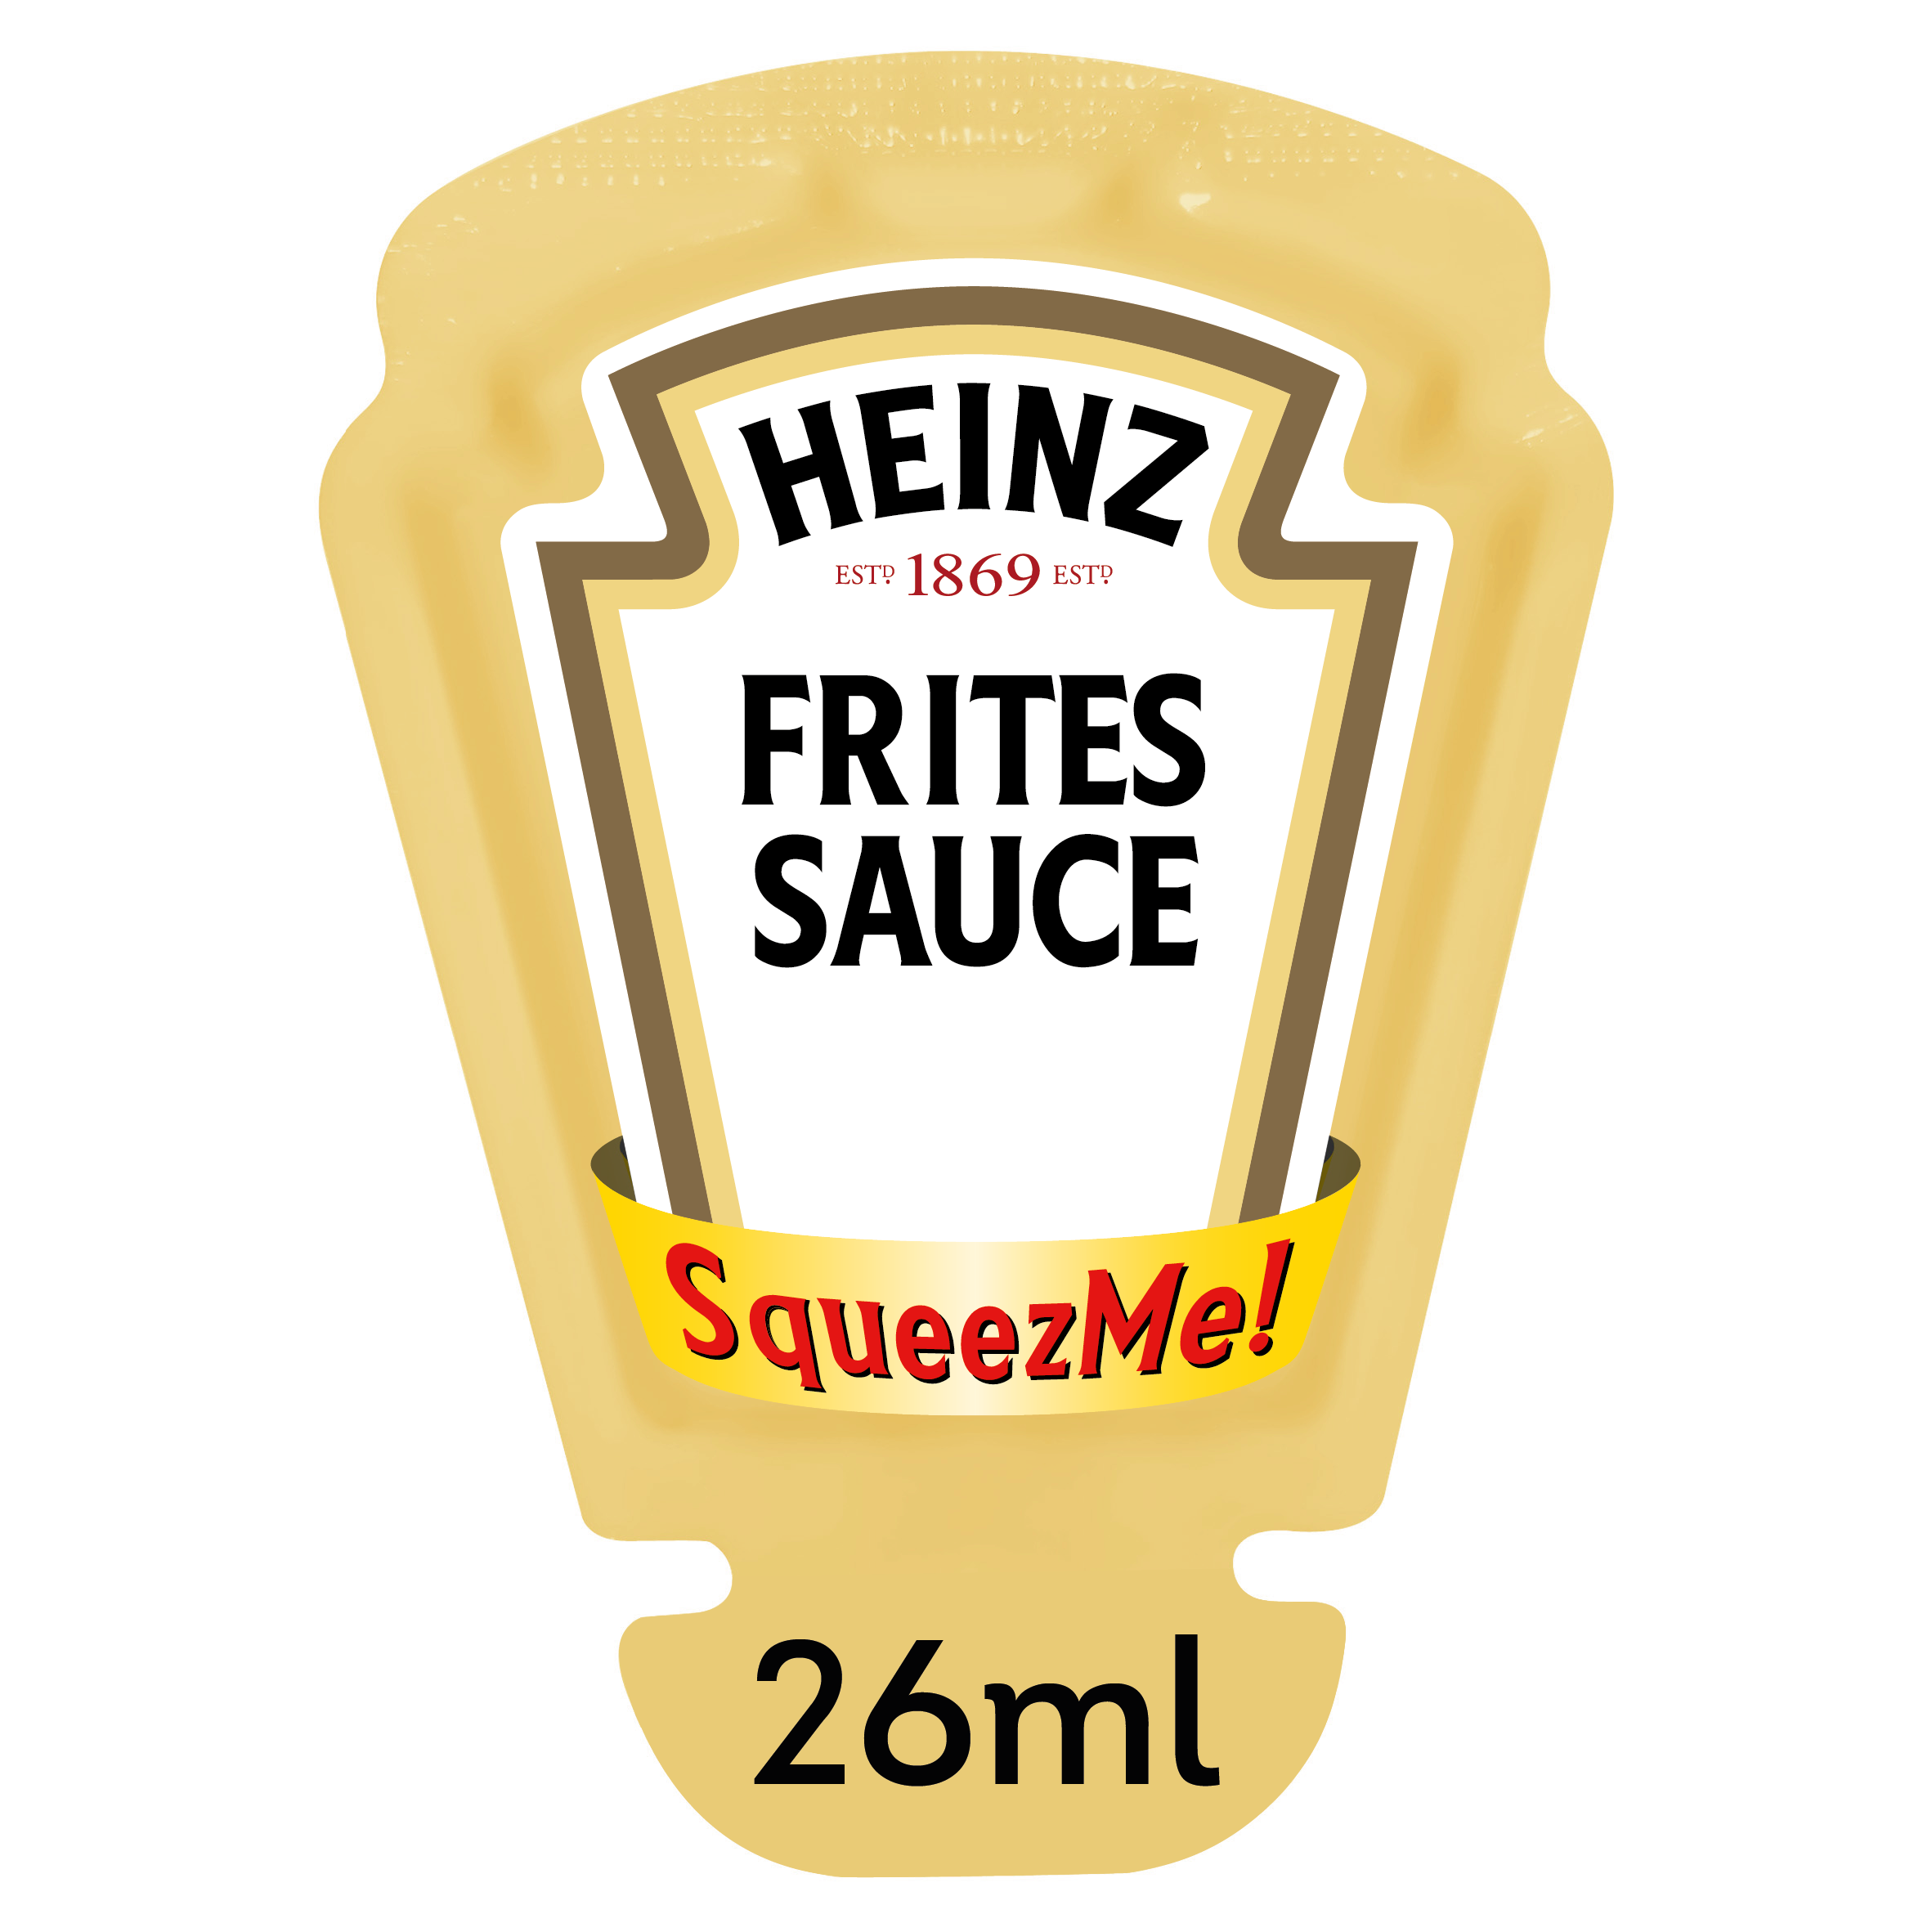 Heinz Fritessaus Squeez-Me 26ml image